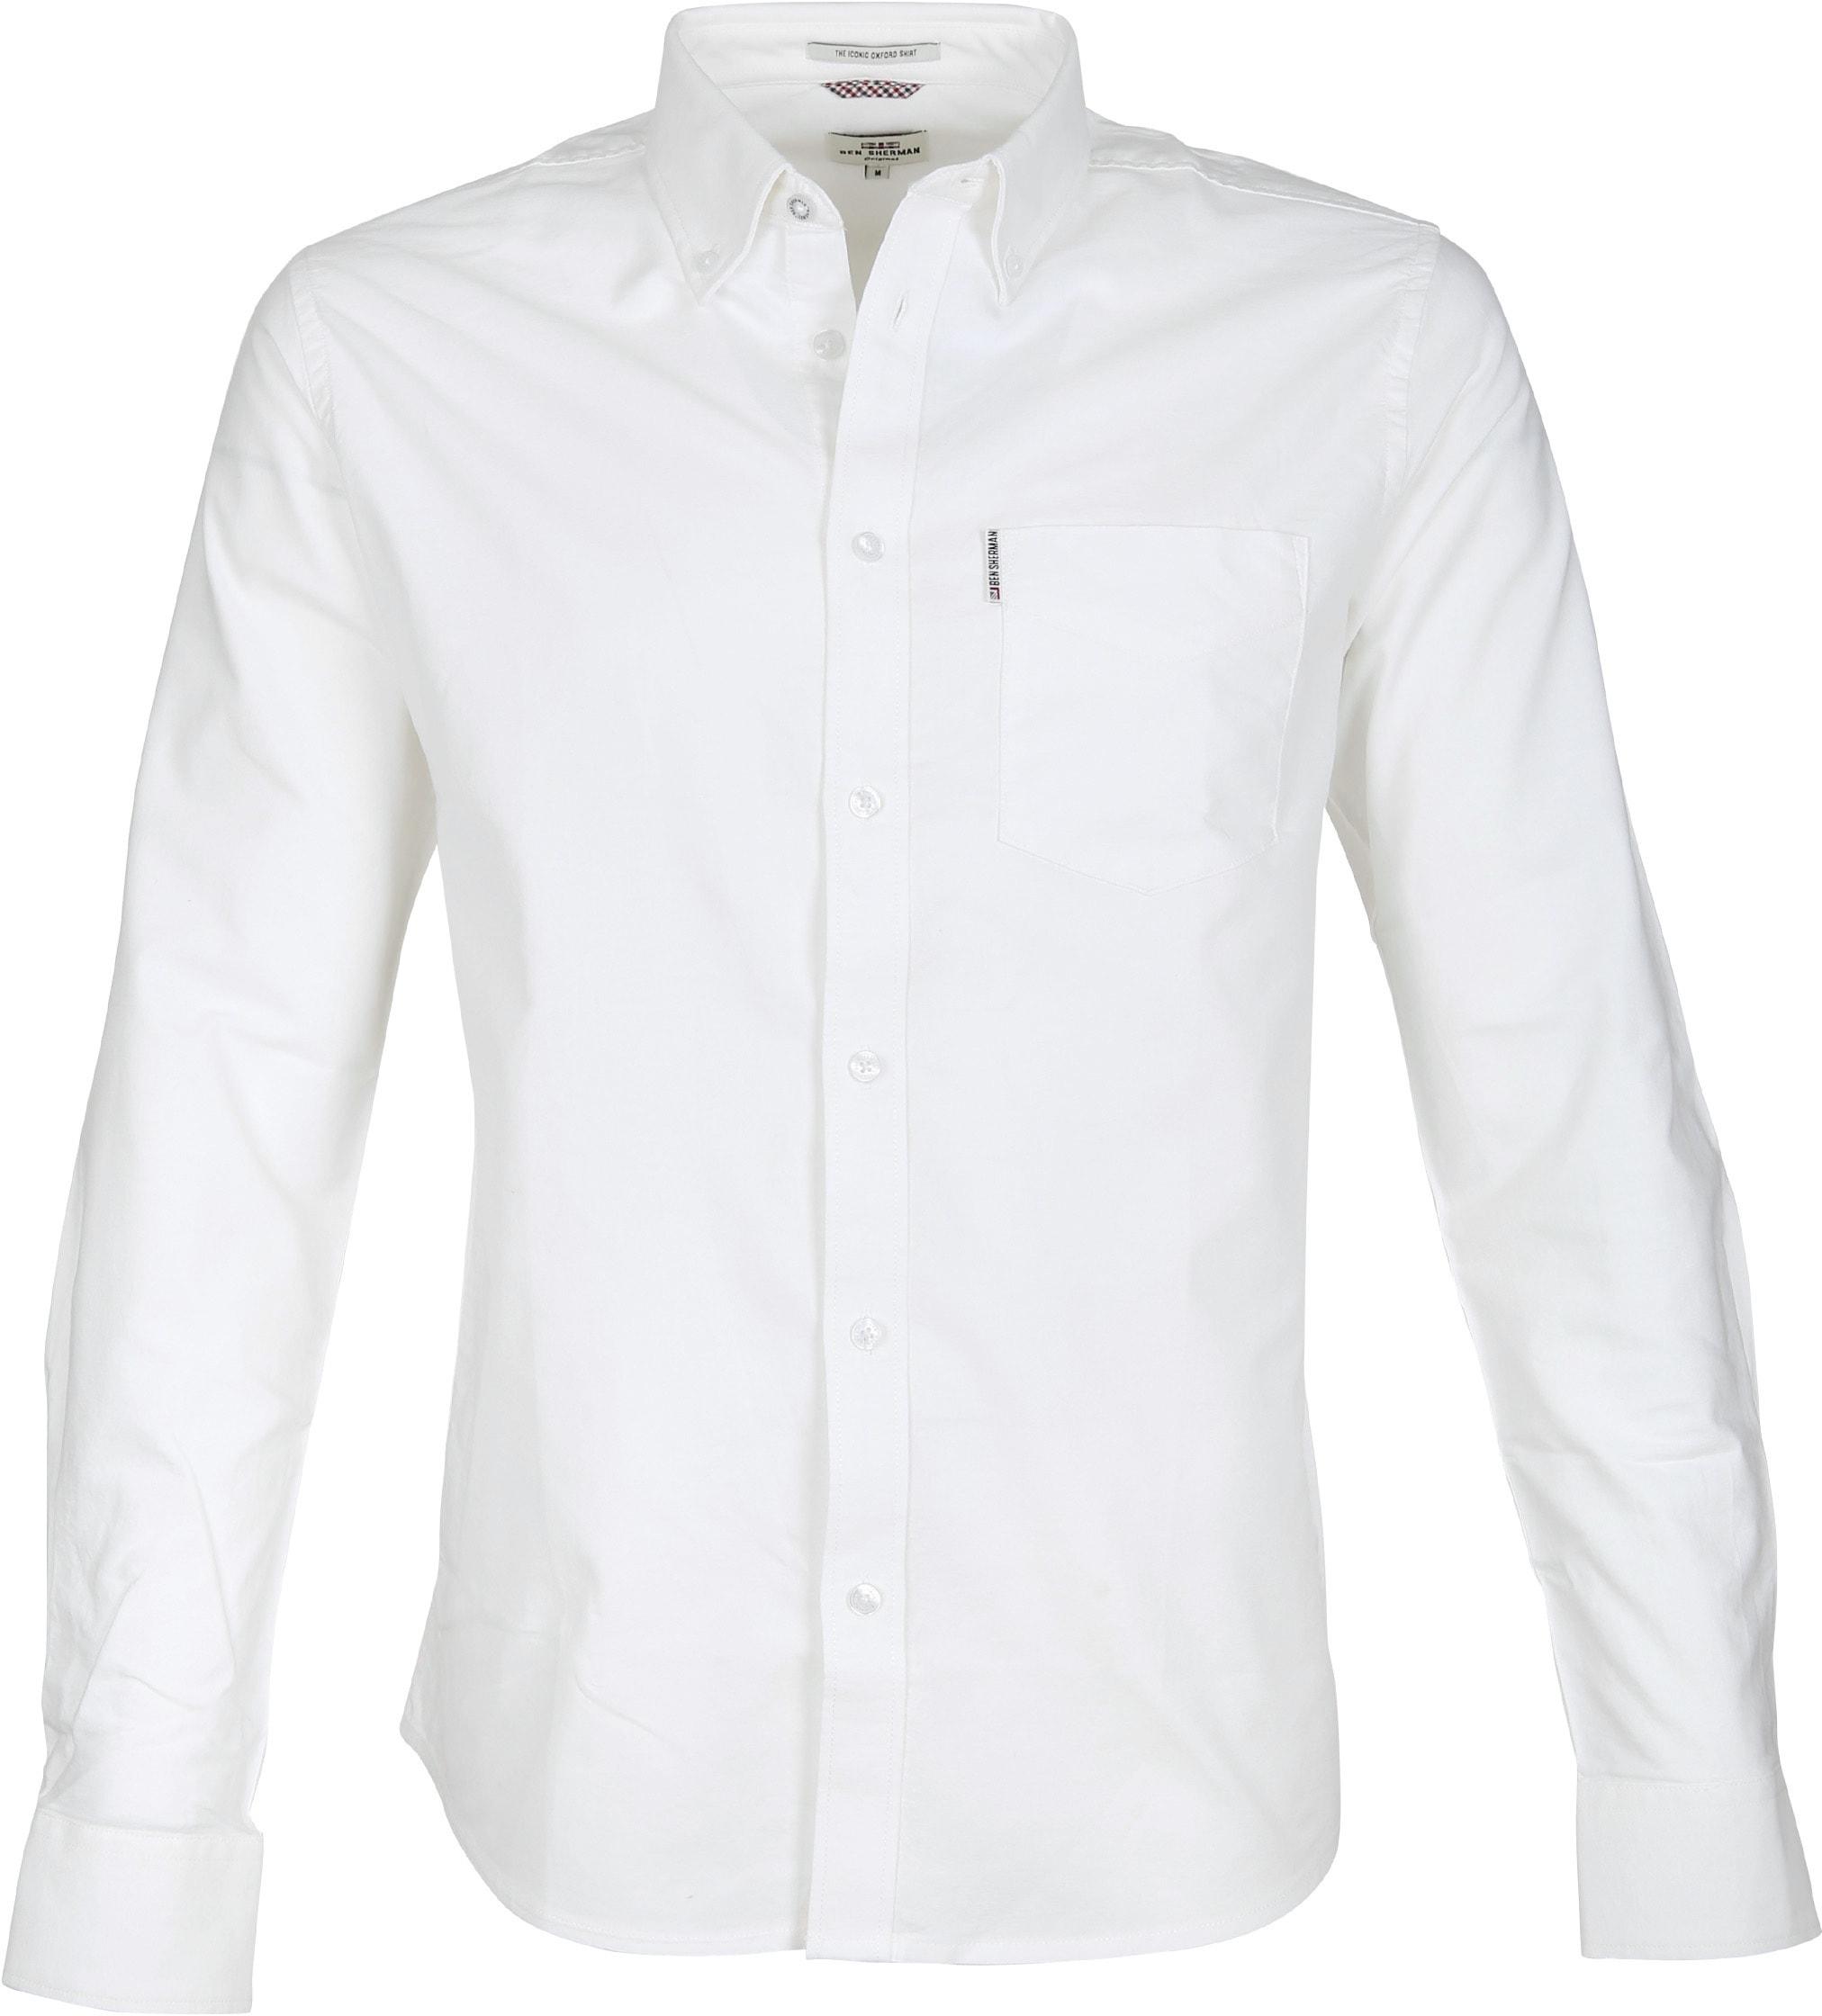 Ben Sherman Shirt Oxford White 0047927 010 Order Online Suitable